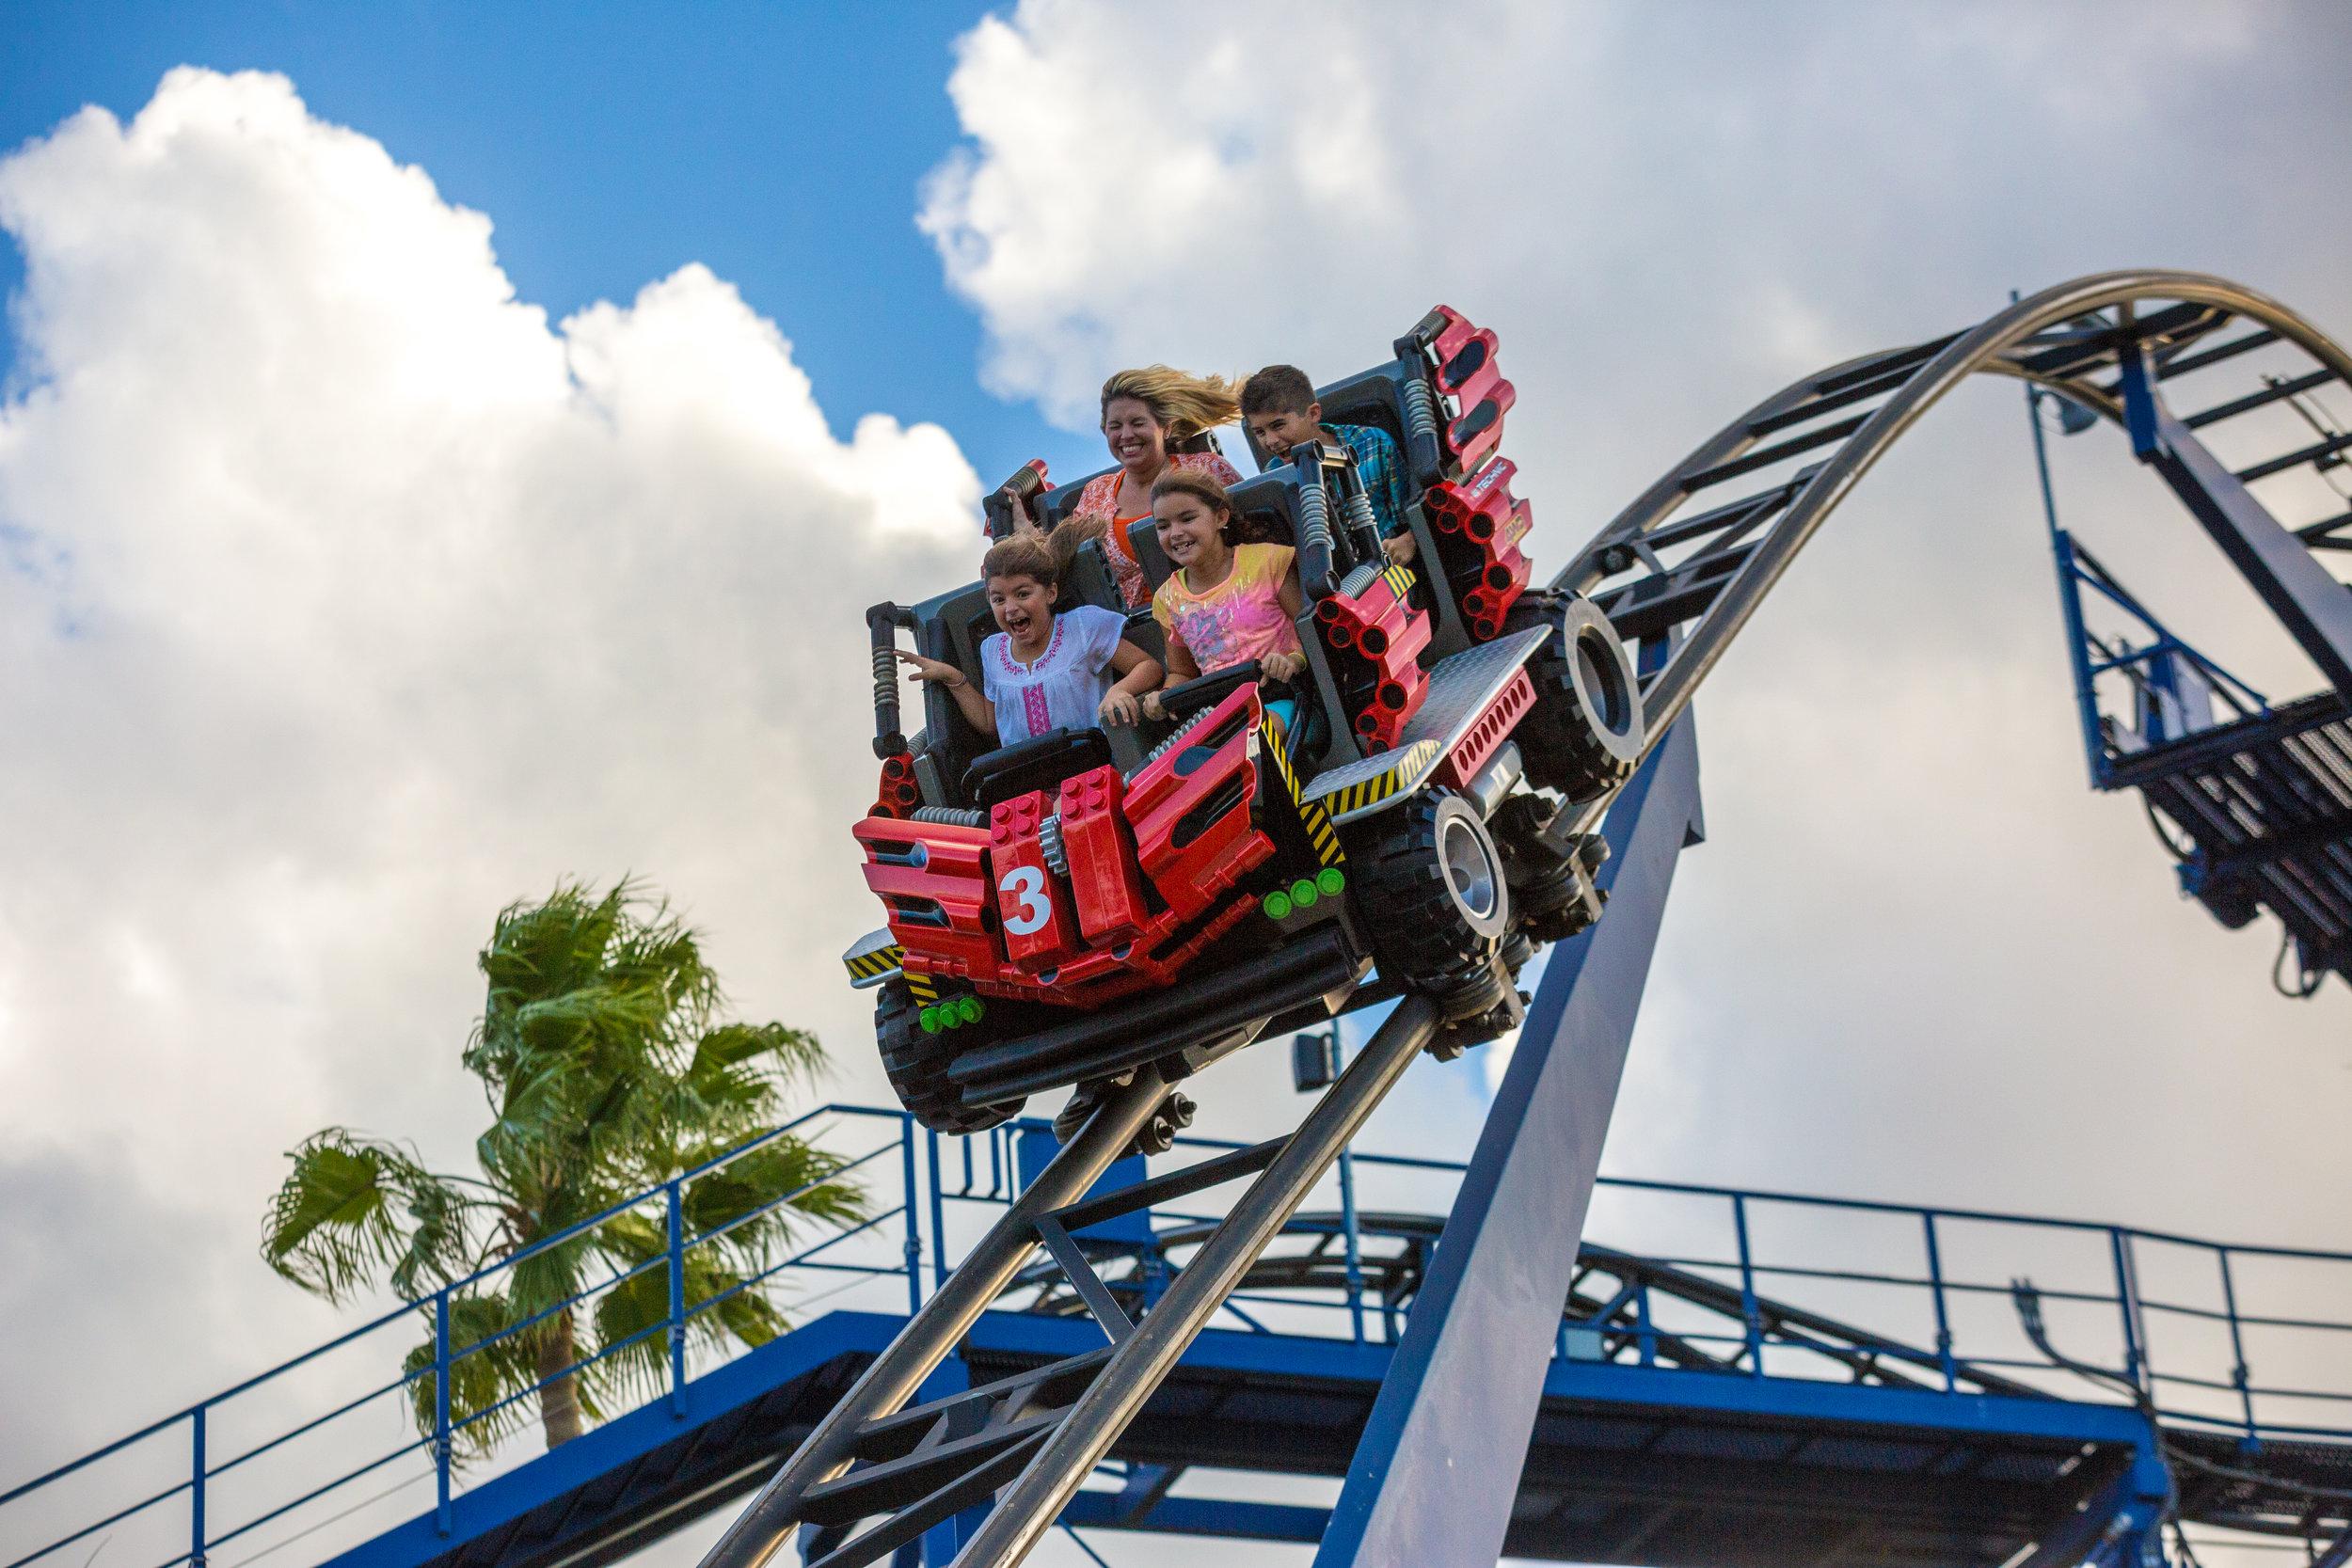 LEGOLAND - park - riding roller coaster.jpg